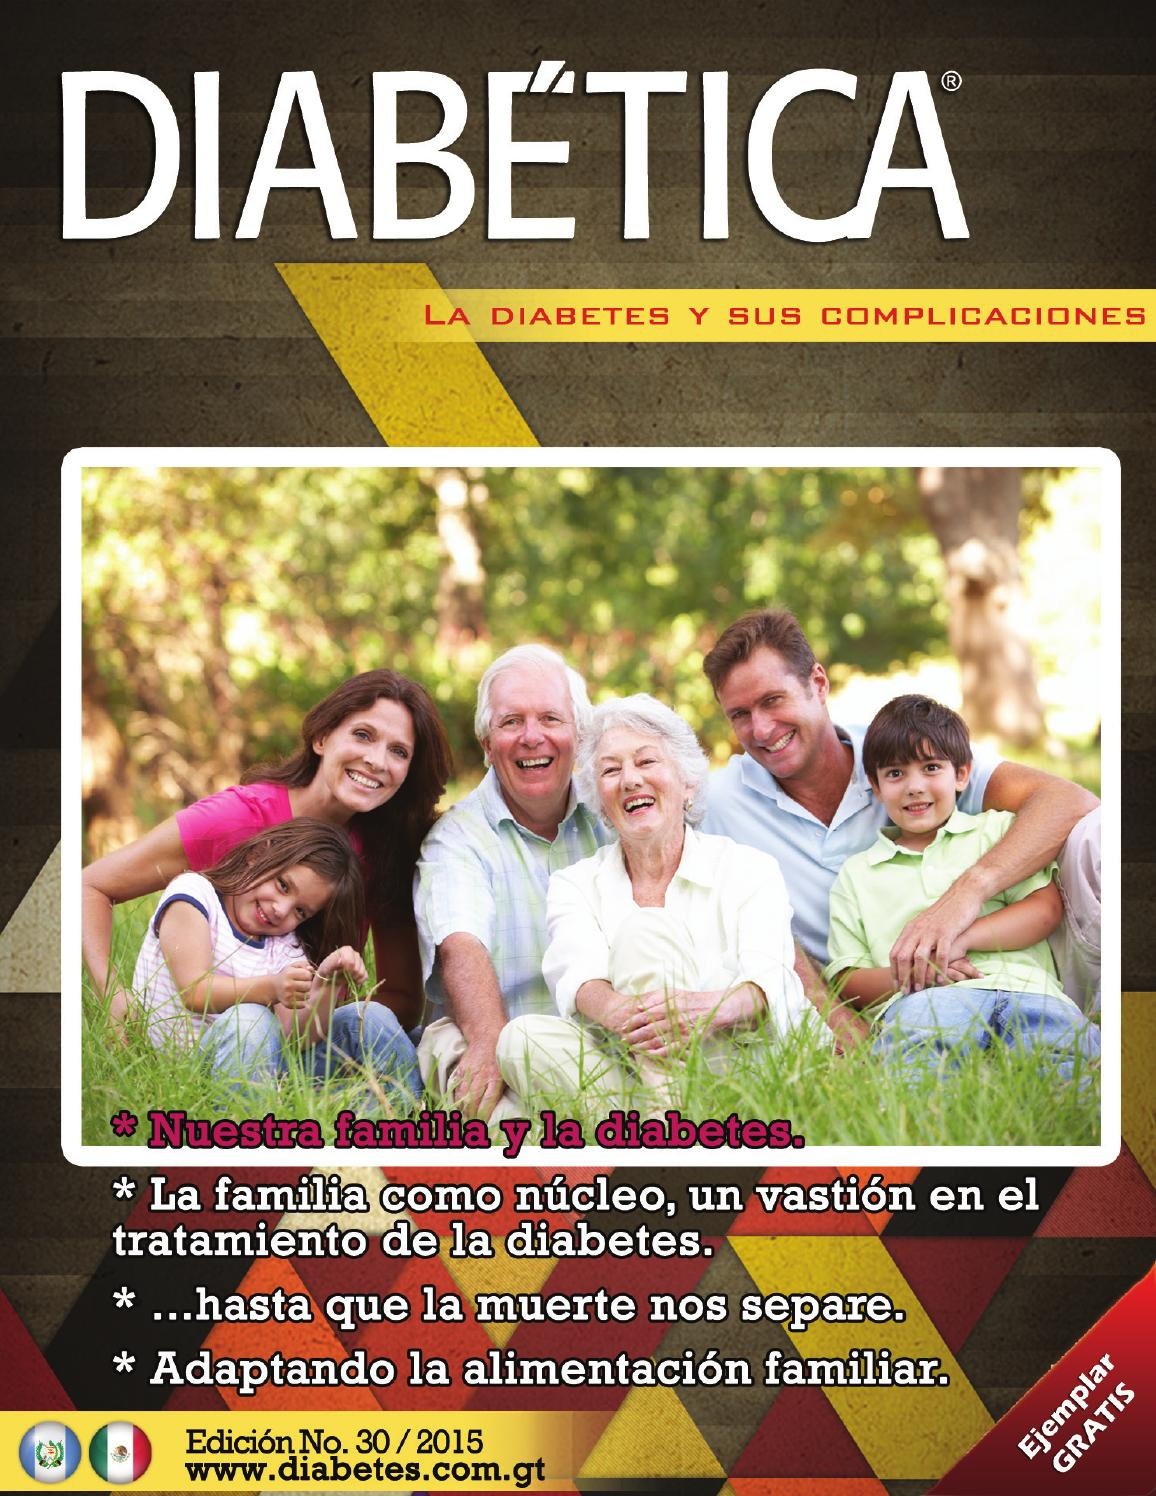 beber leche por la noche diarrea diabetes